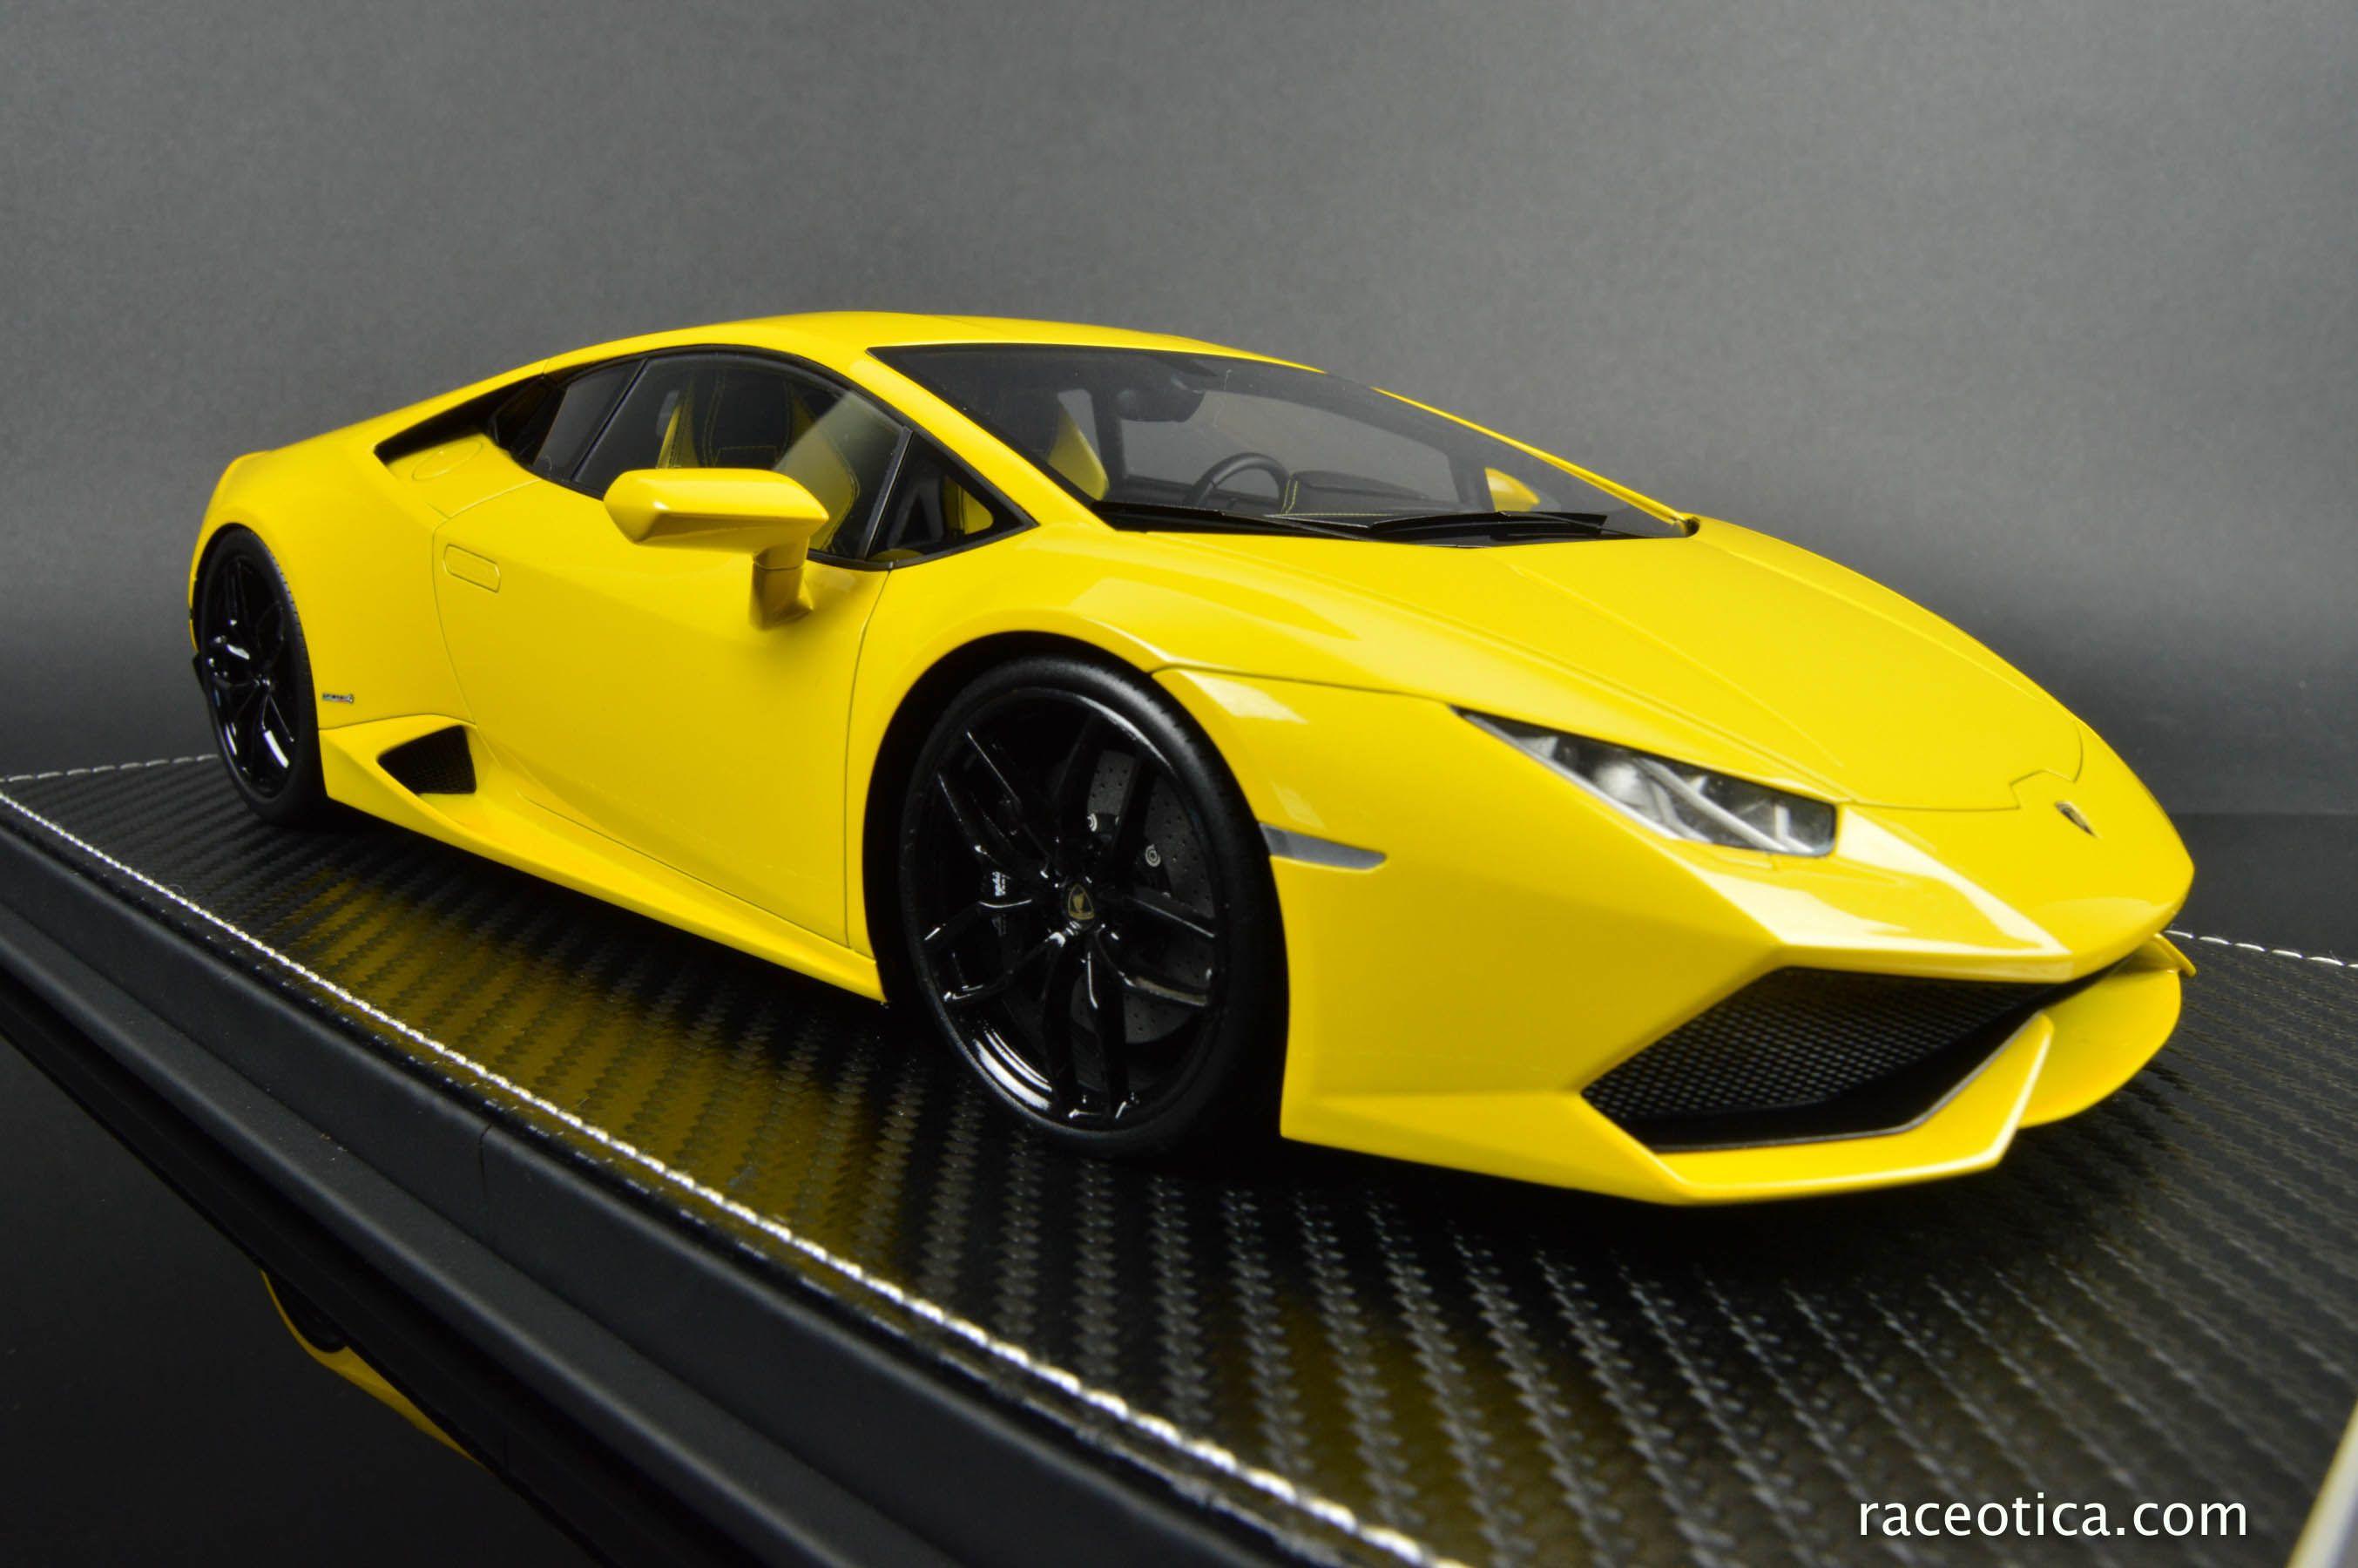 Kyosho FrontiArt Yellow Lamborbhini Huracan! A true piece of art in ...